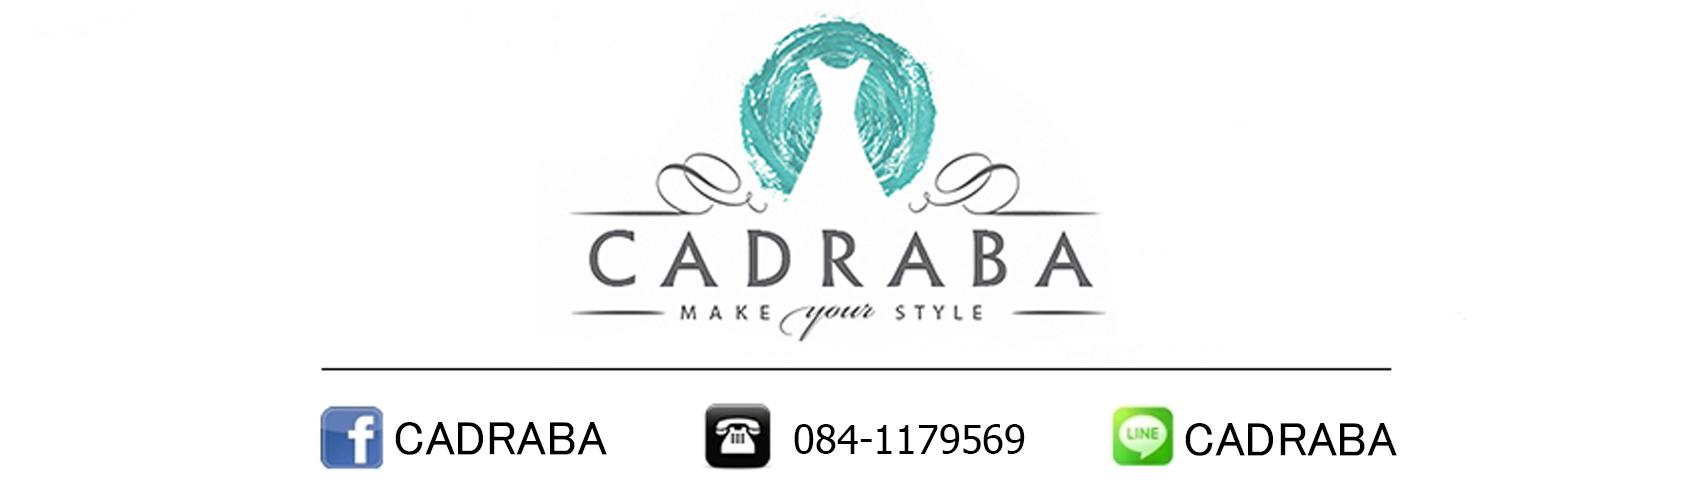 Cadraba